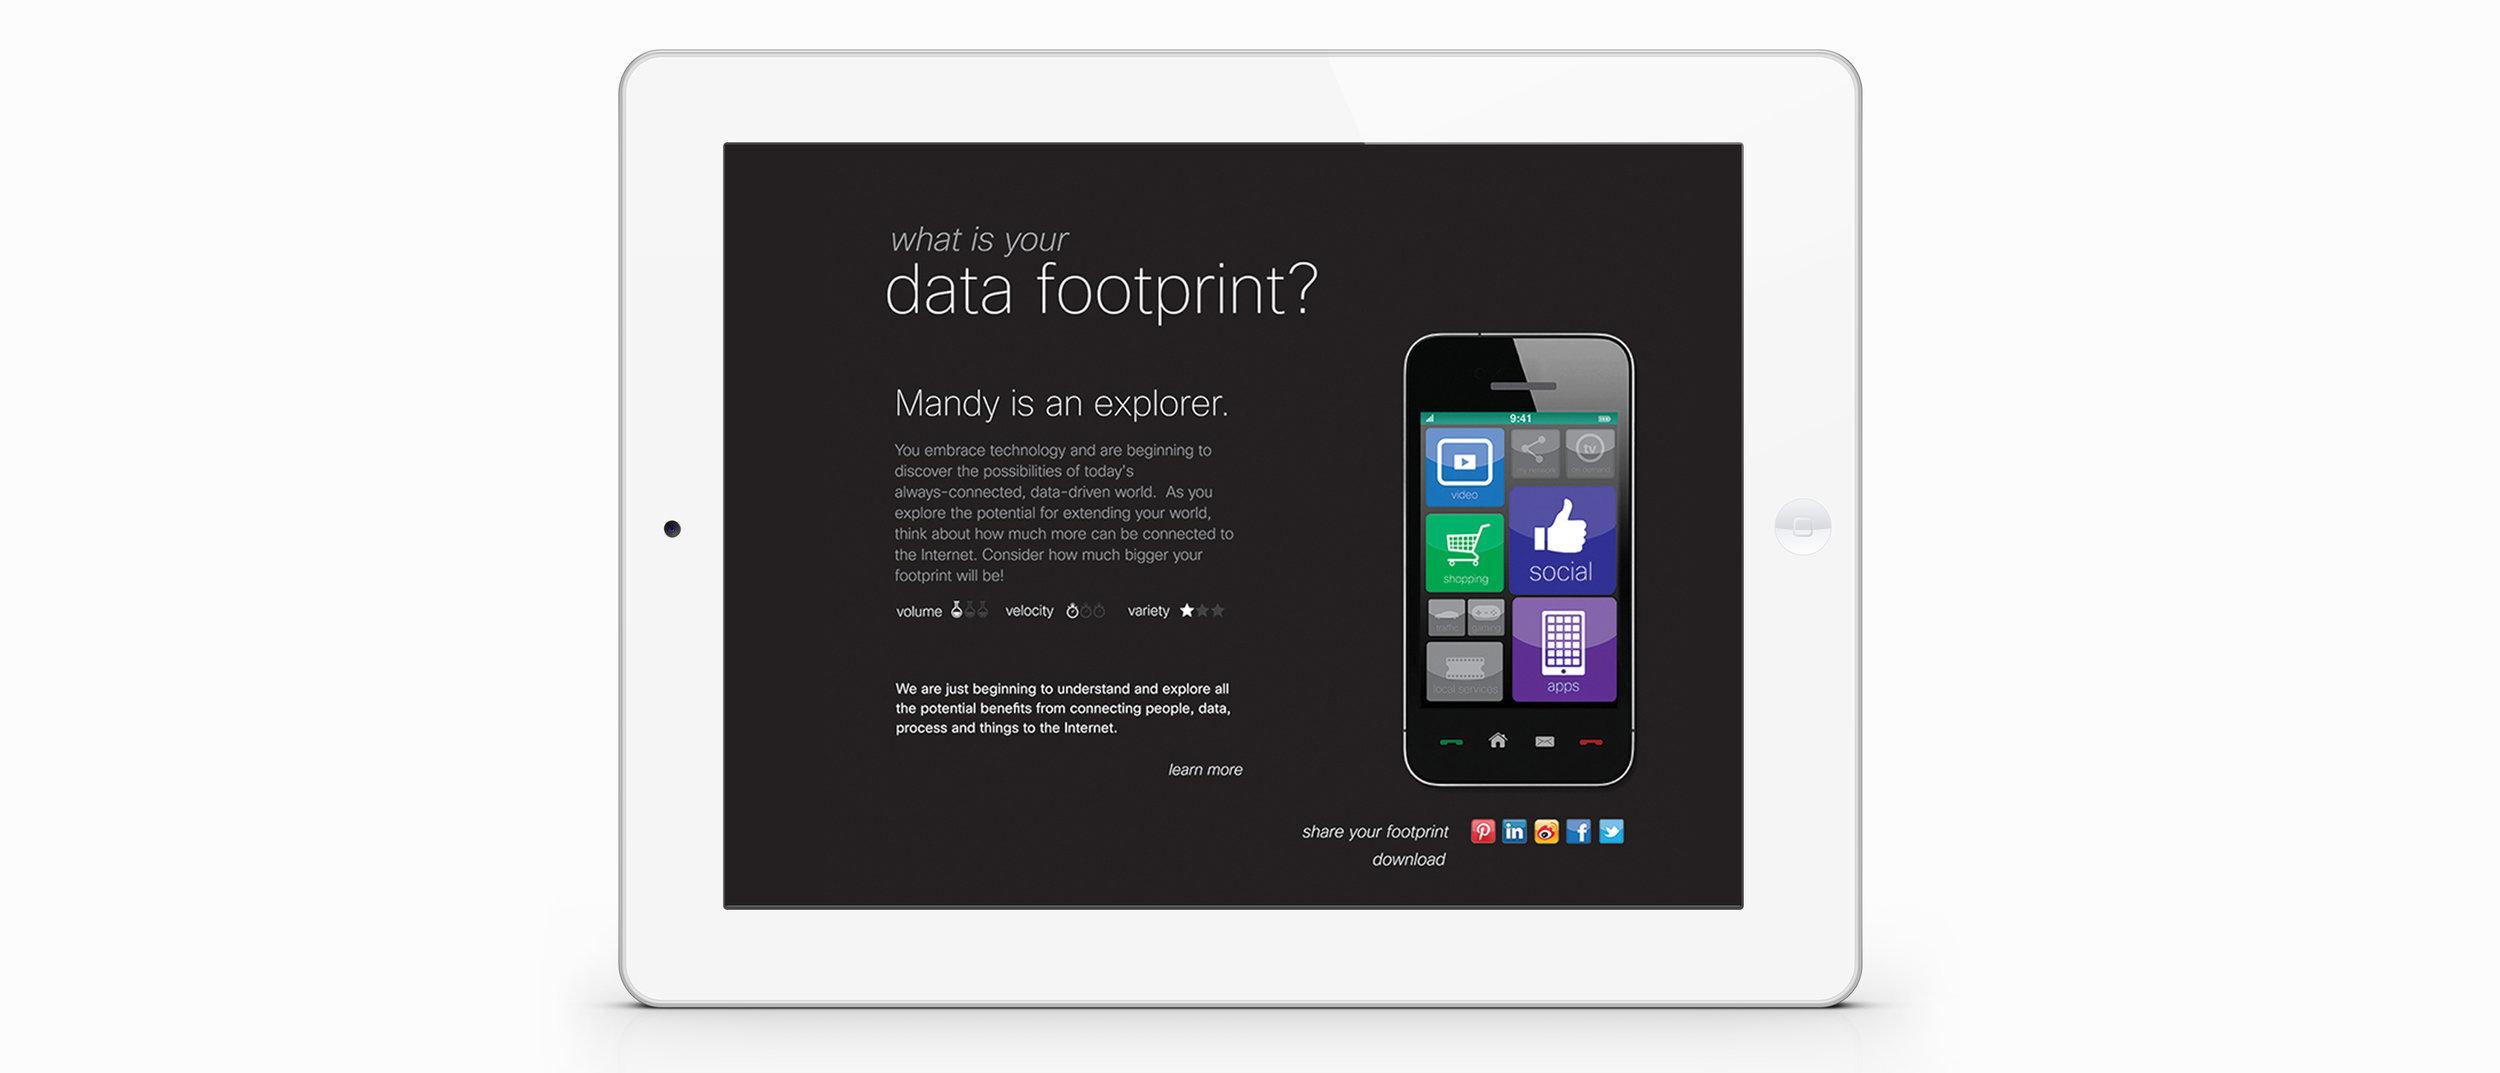 Footprint_iPad_8 copy.jpg